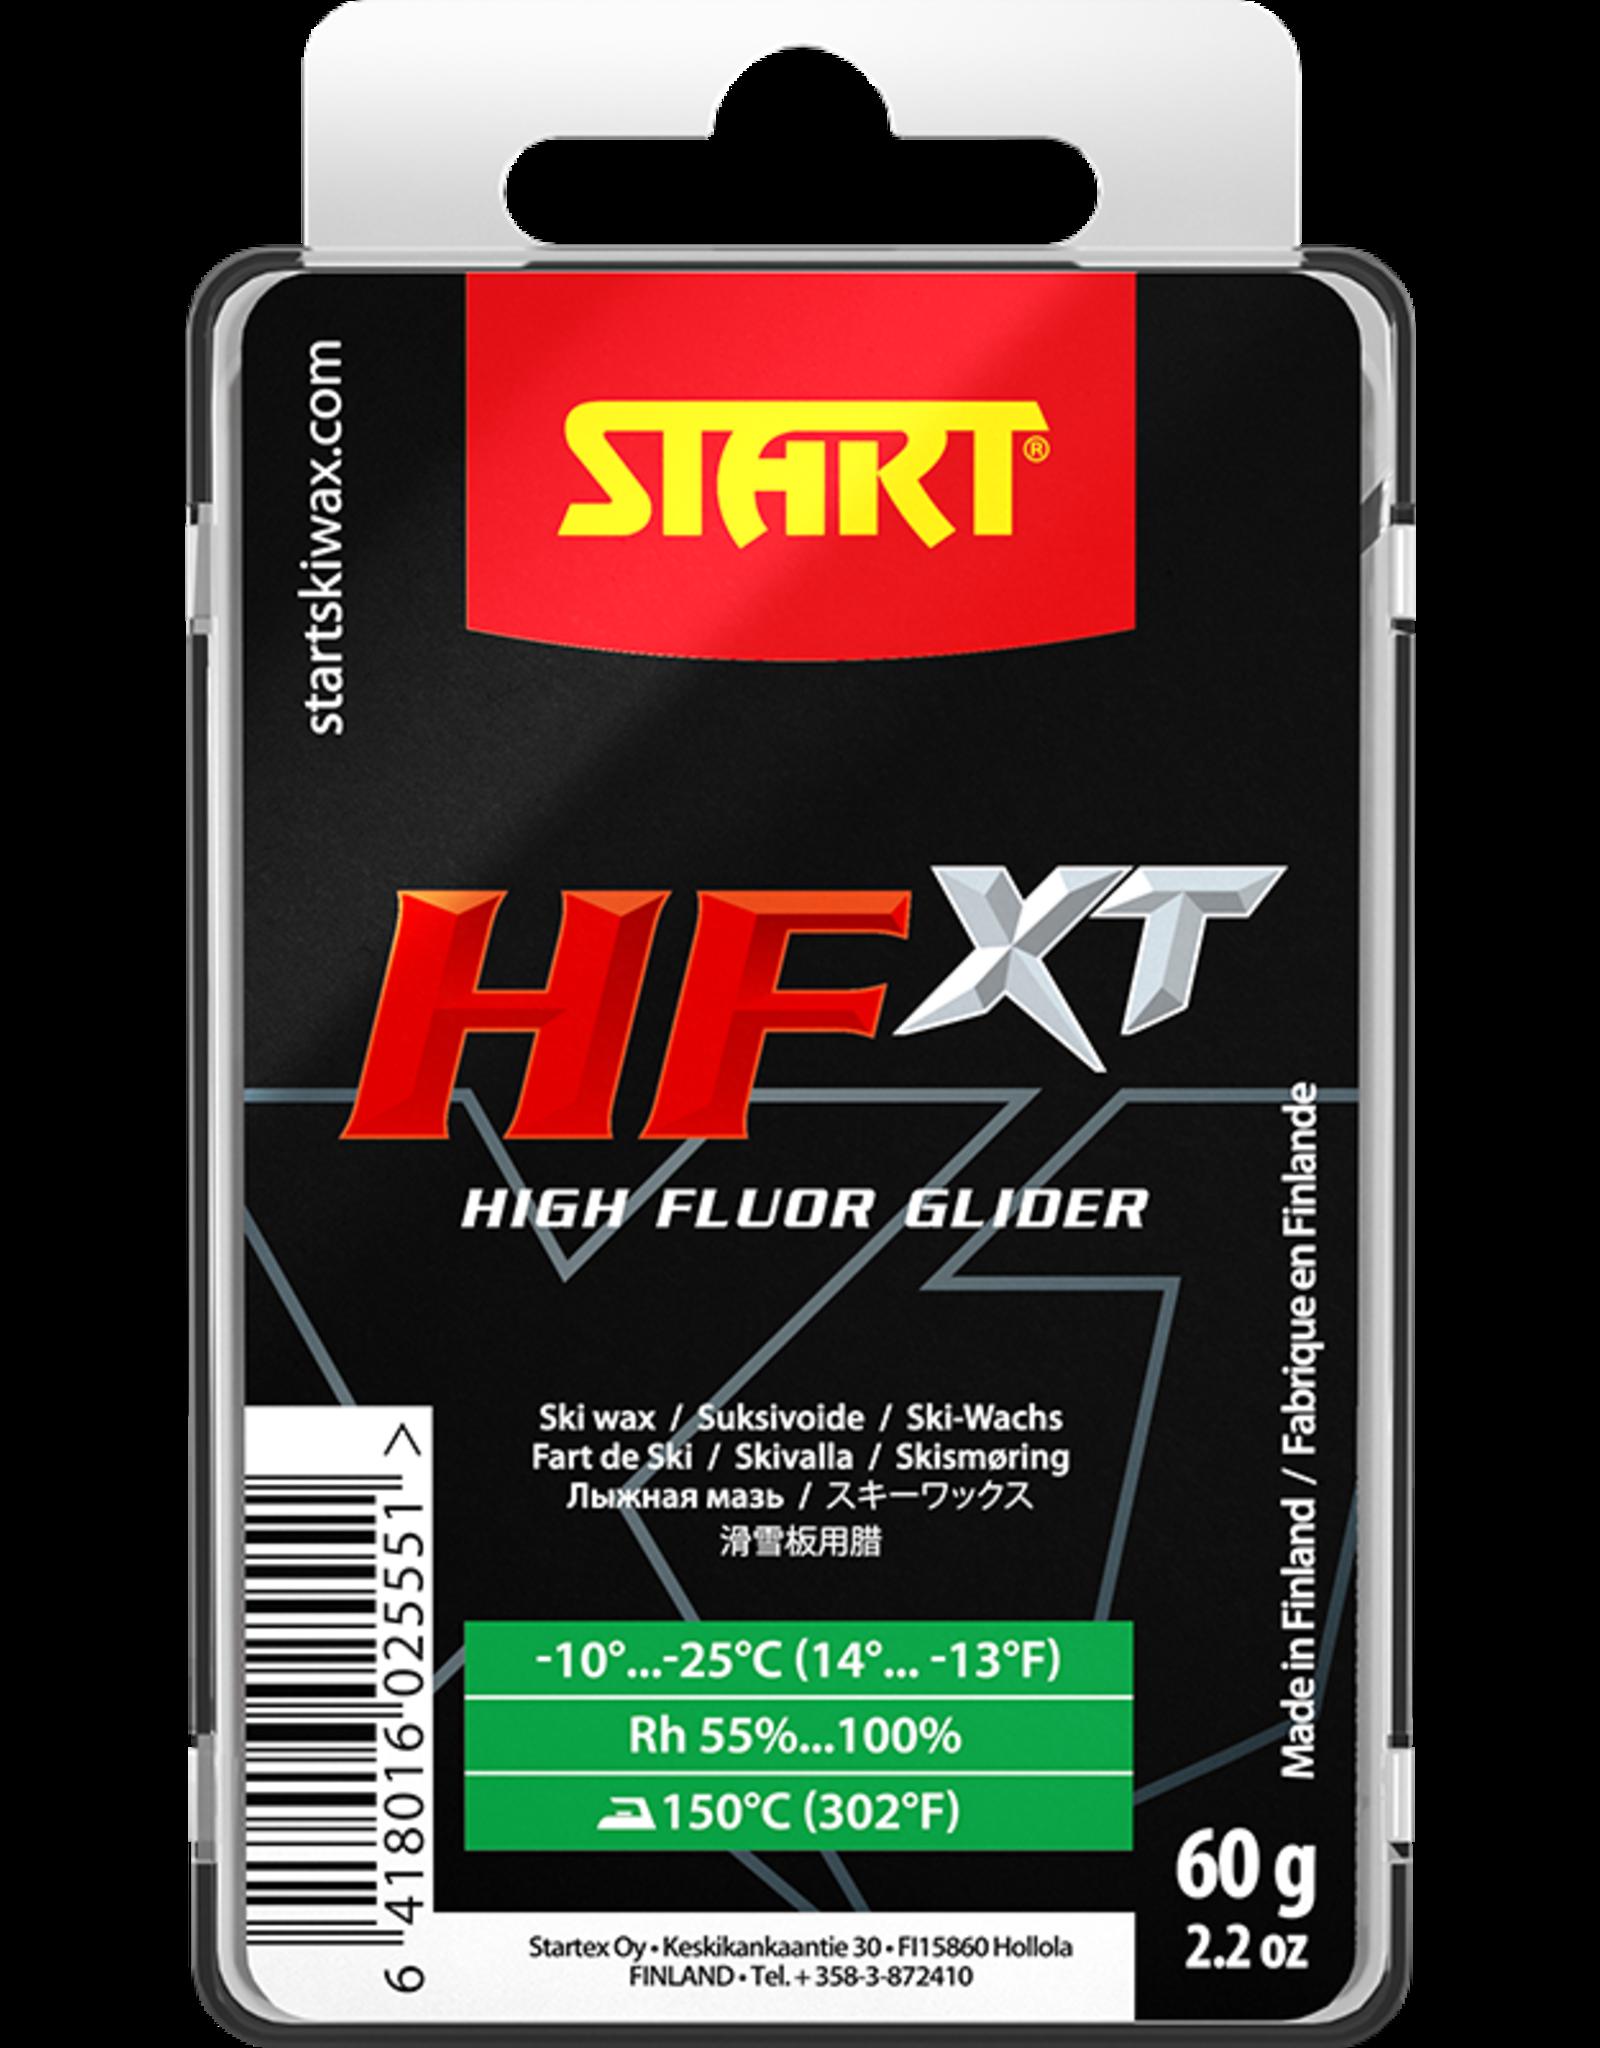 Start HFXT Green Flour Glider 60g